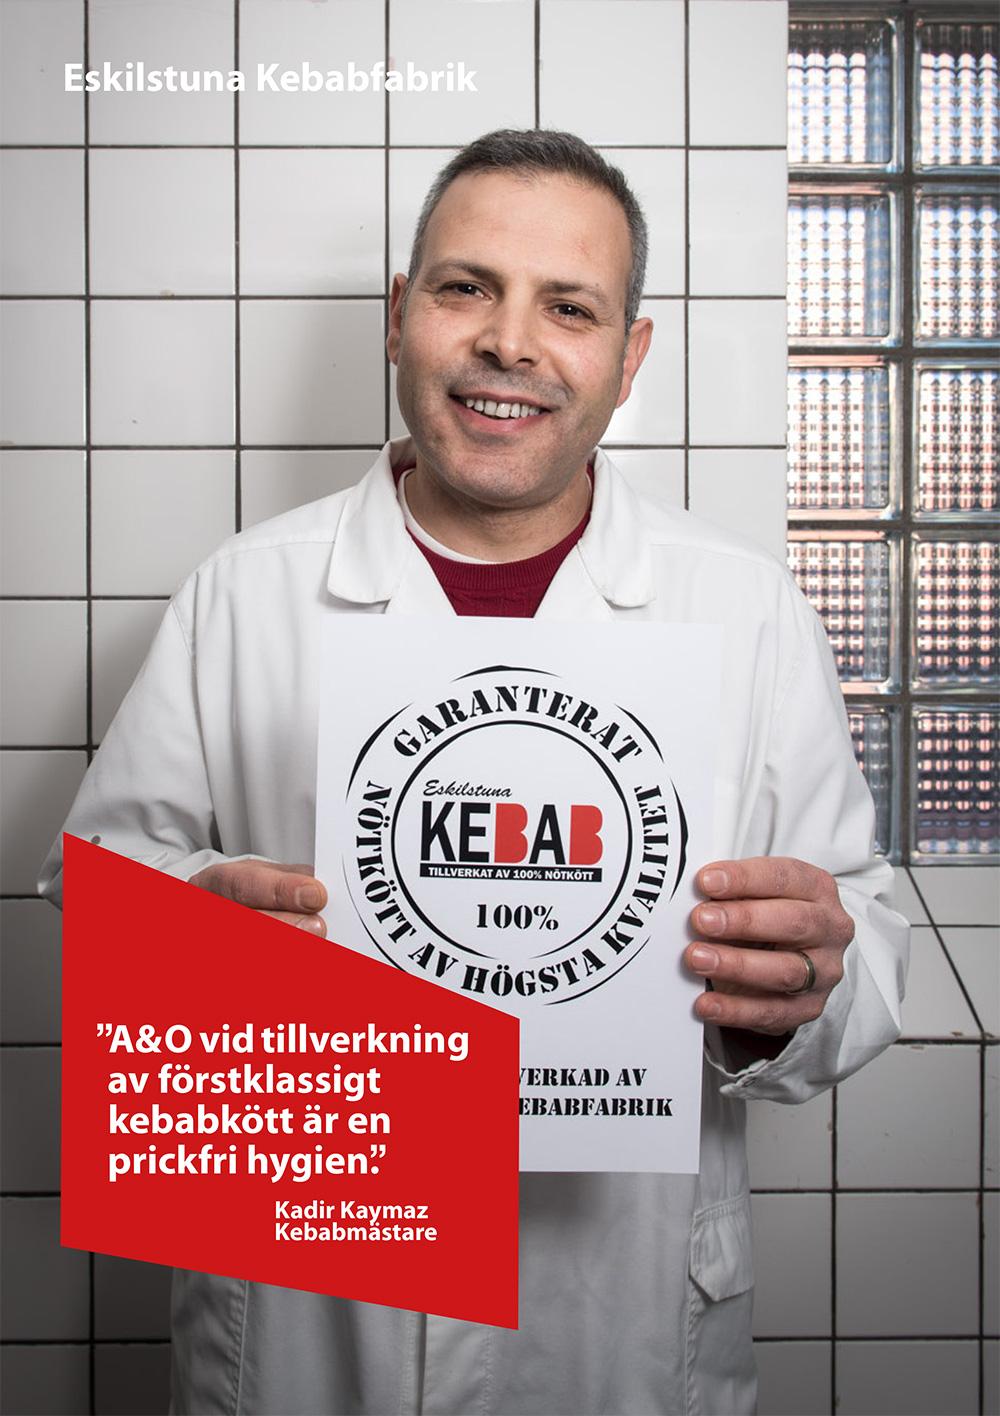 Eskilstuna-Kebabfabrik-2